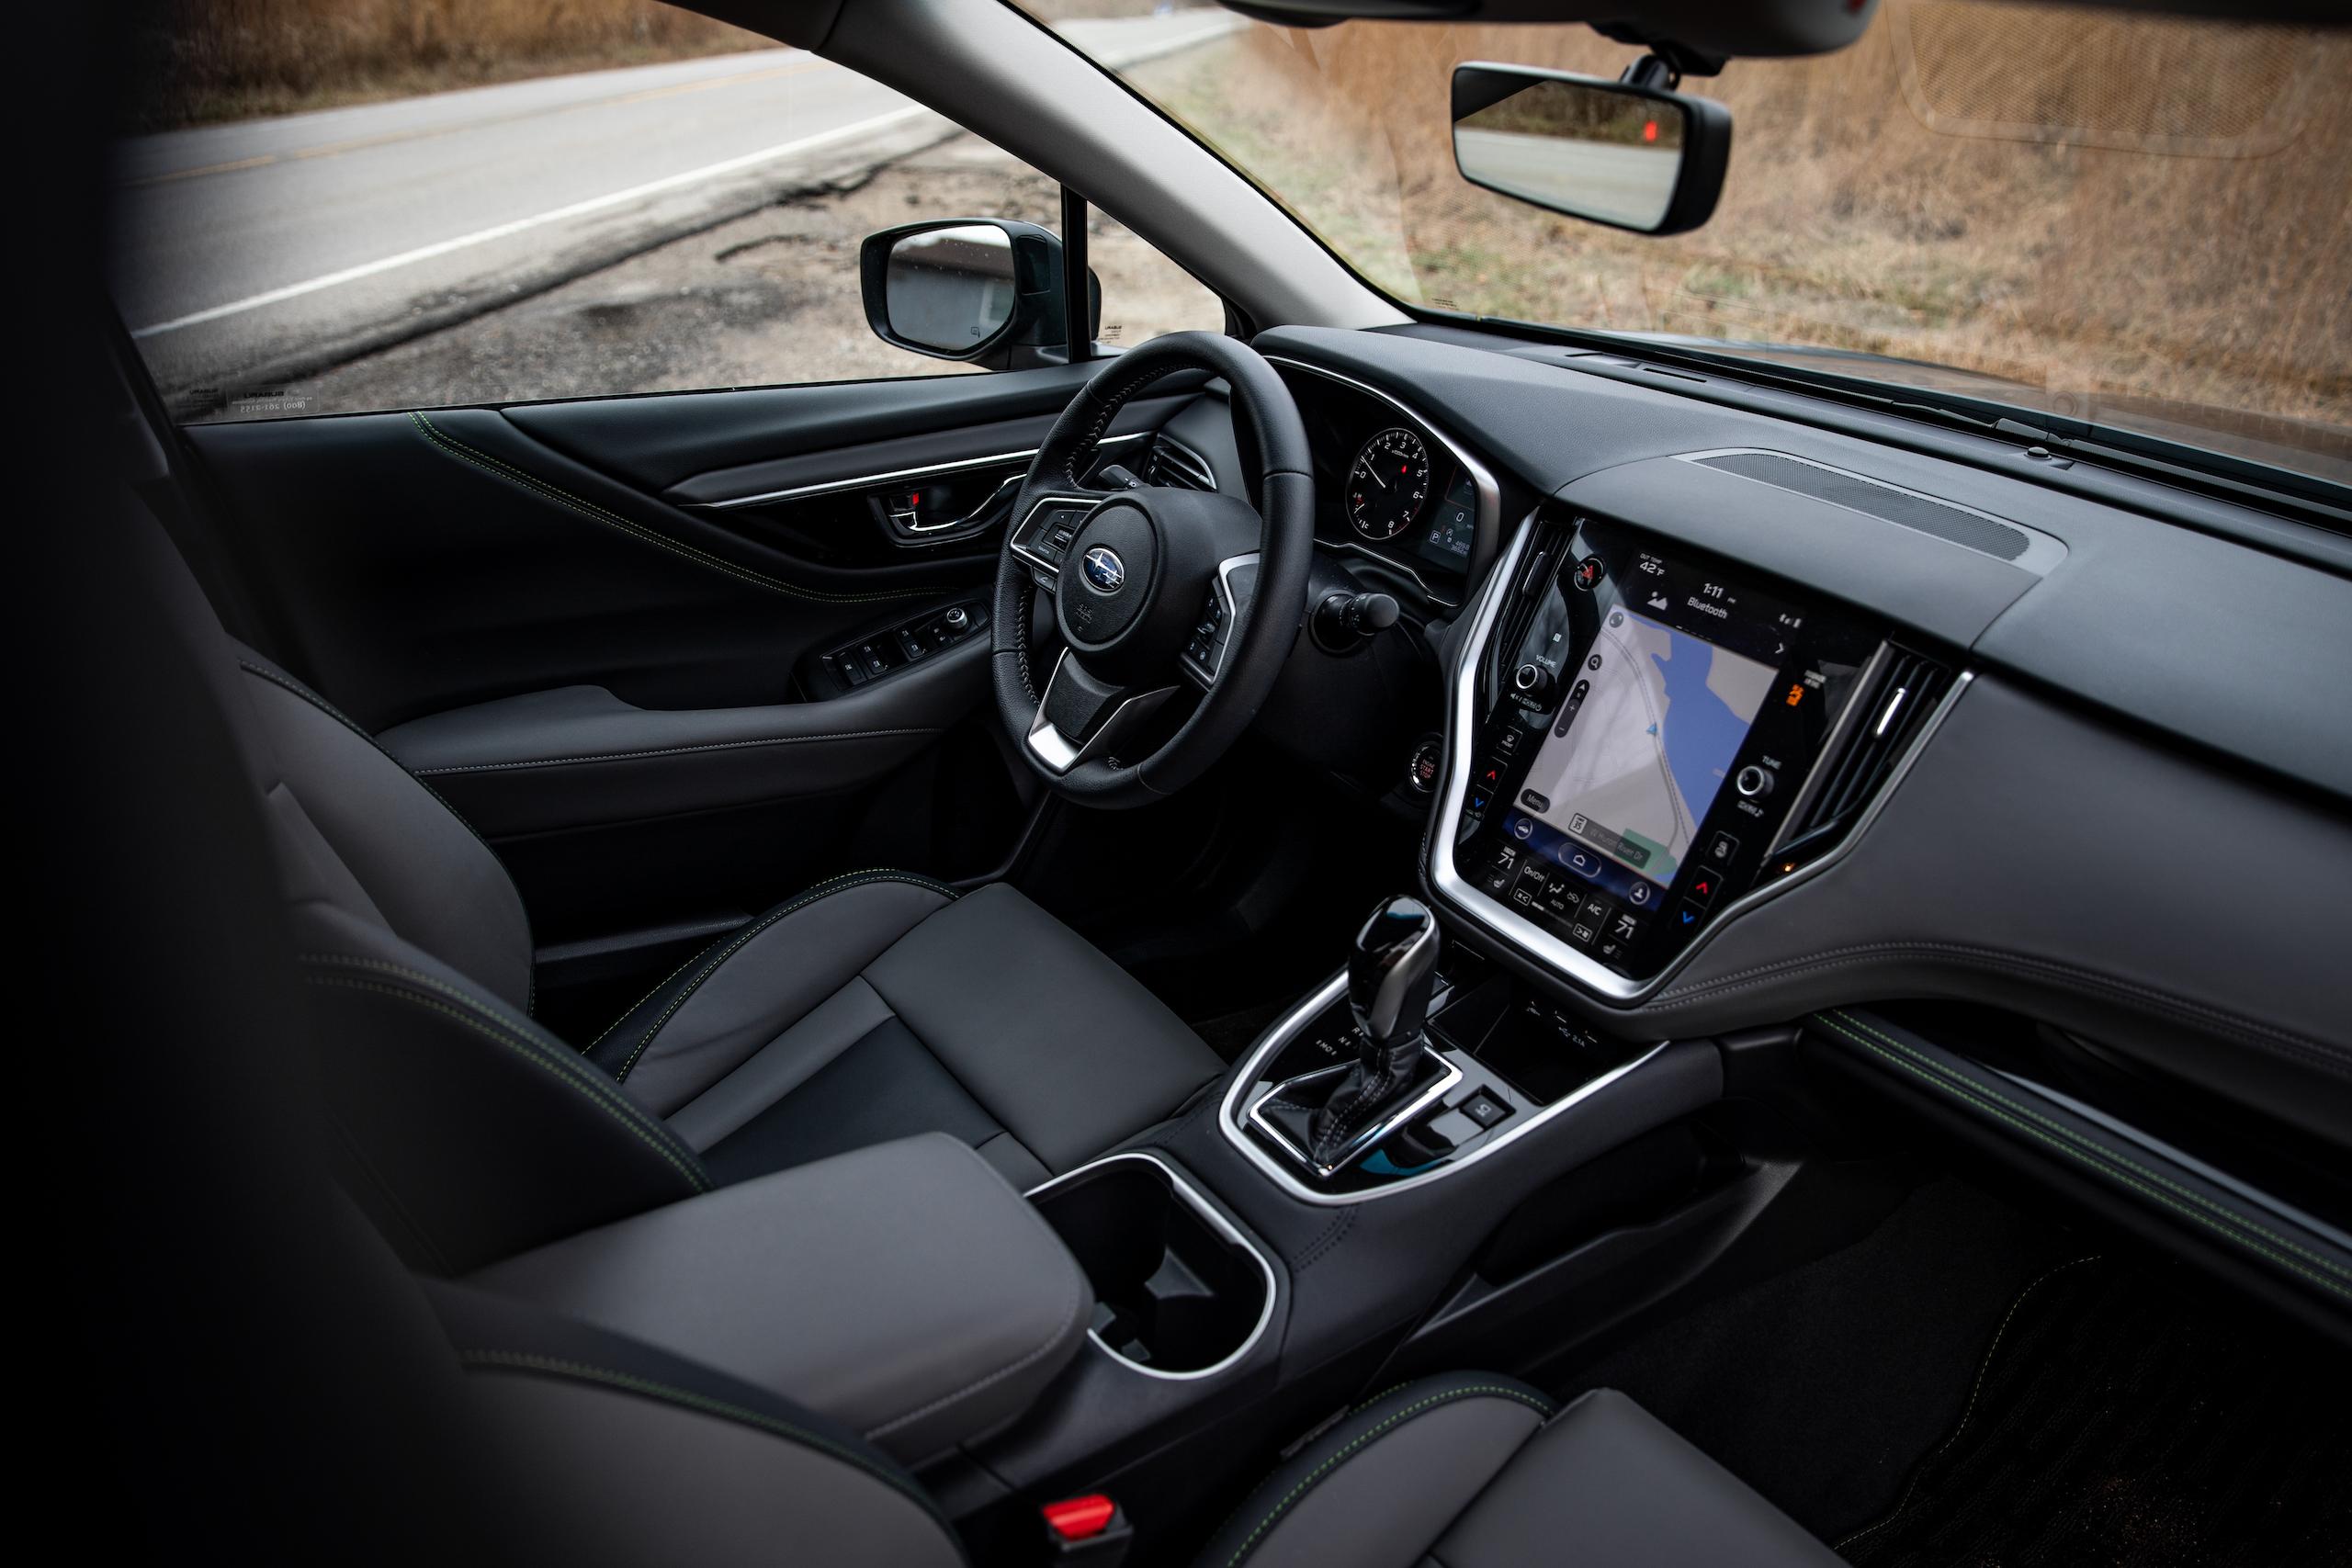 Subaru Outback interior front angle